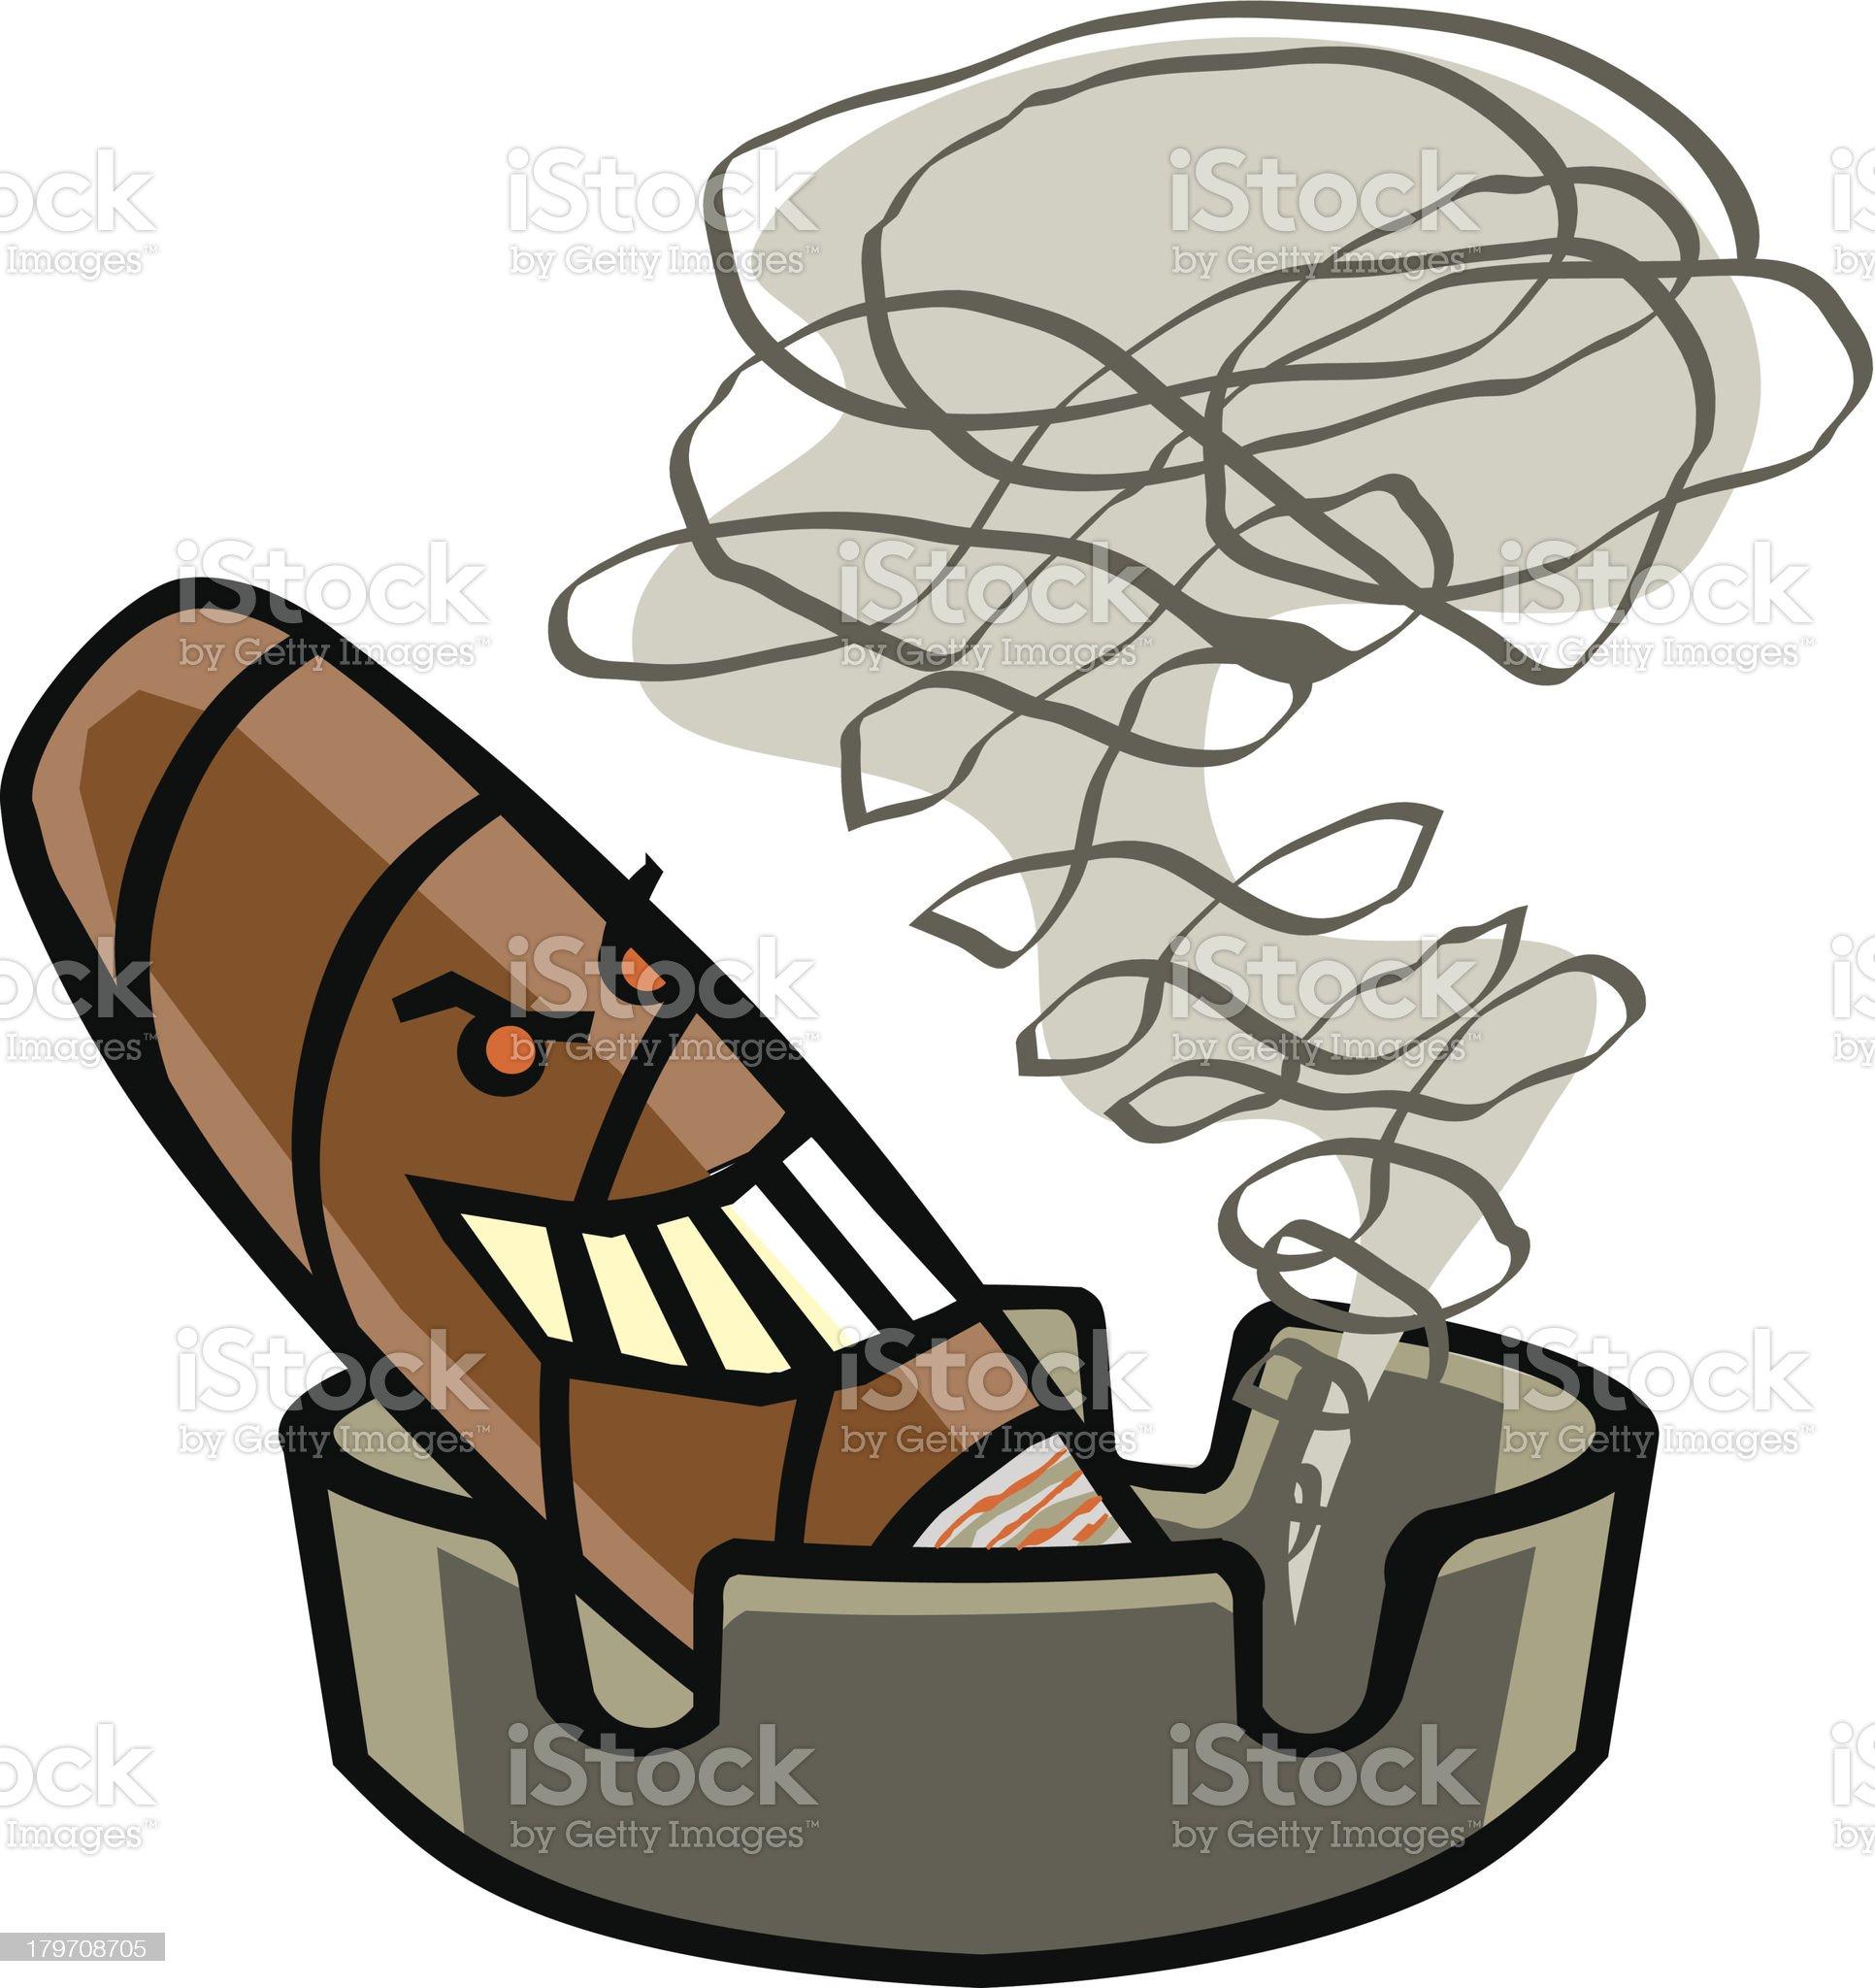 Cigar in Ashtray royalty-free stock vector art